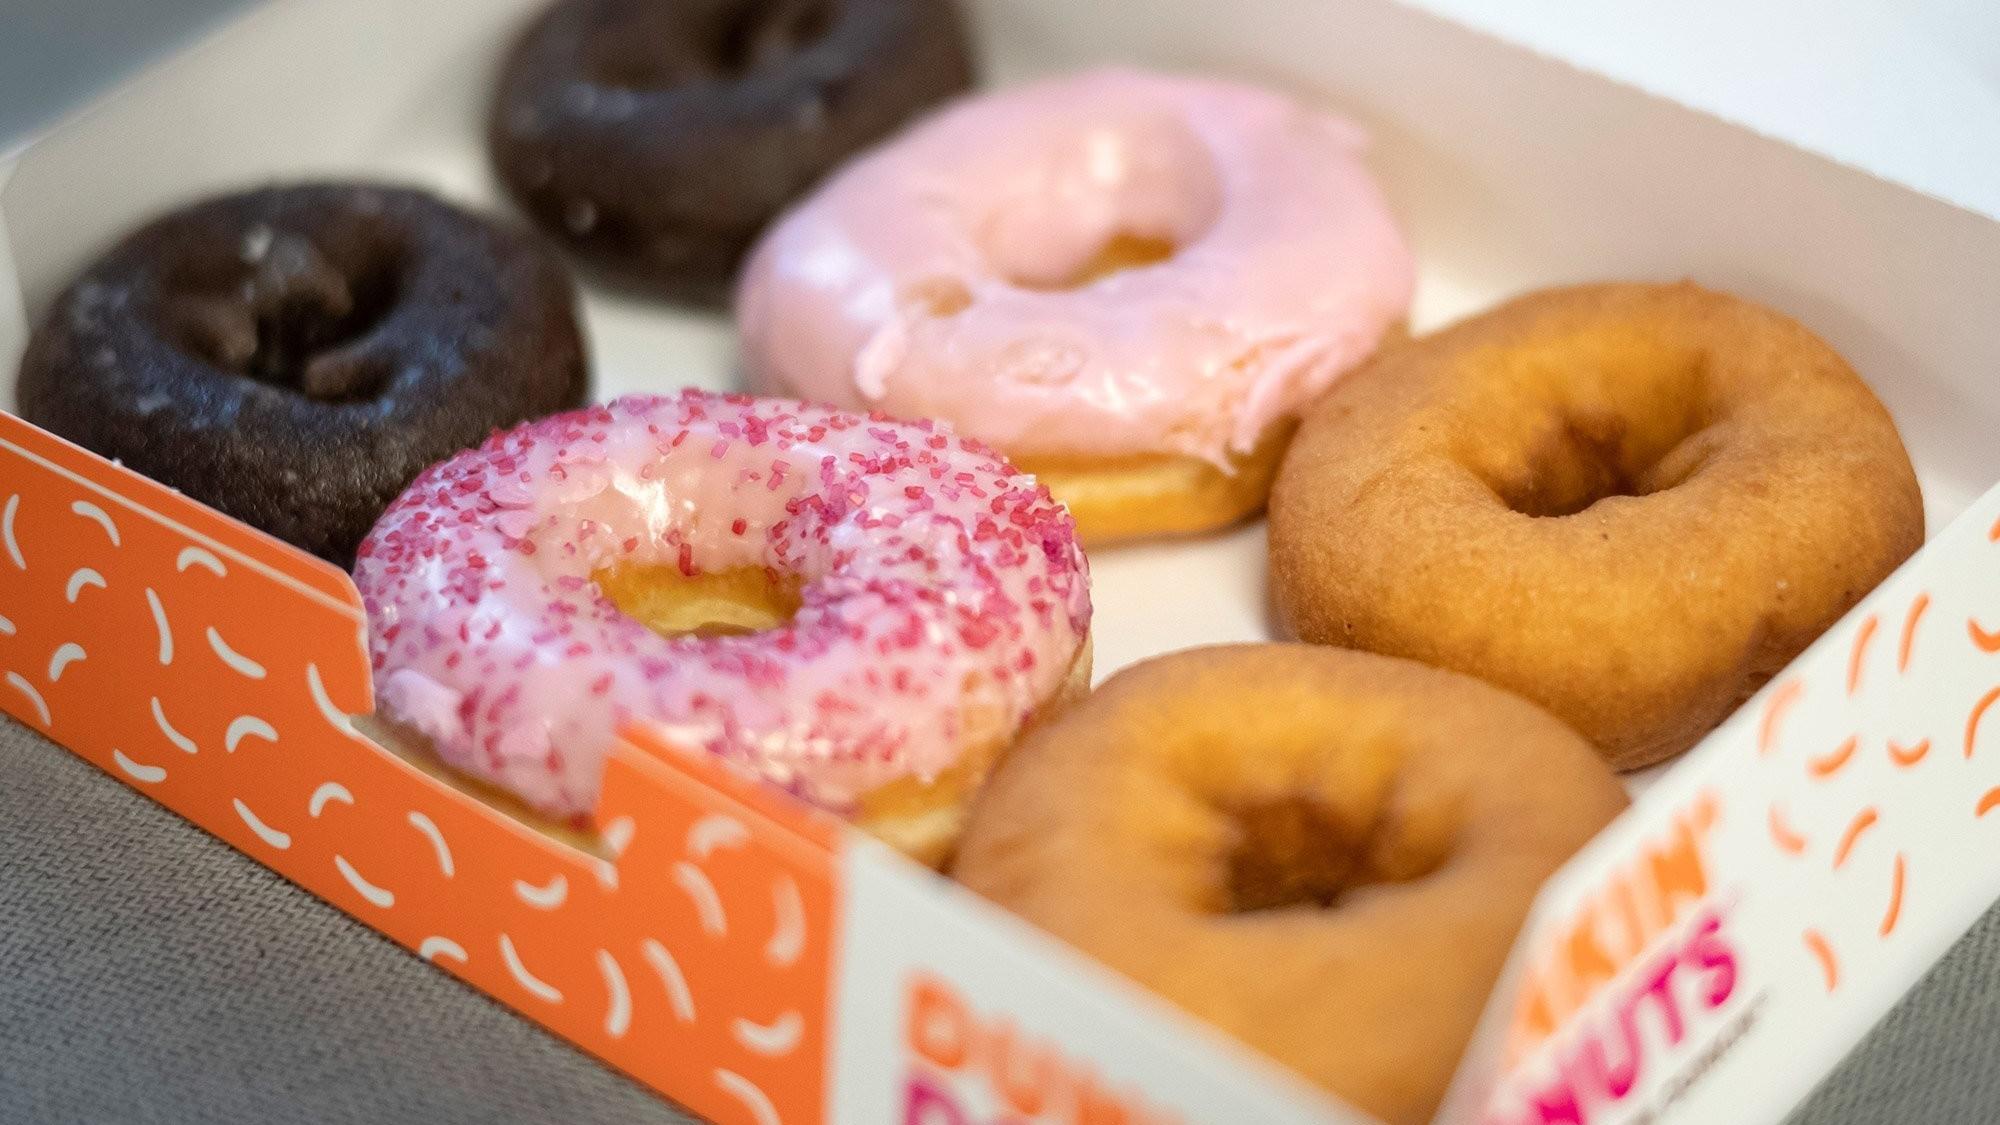 Transgender Ex Cashier Sues Dunkin Donuts Saying